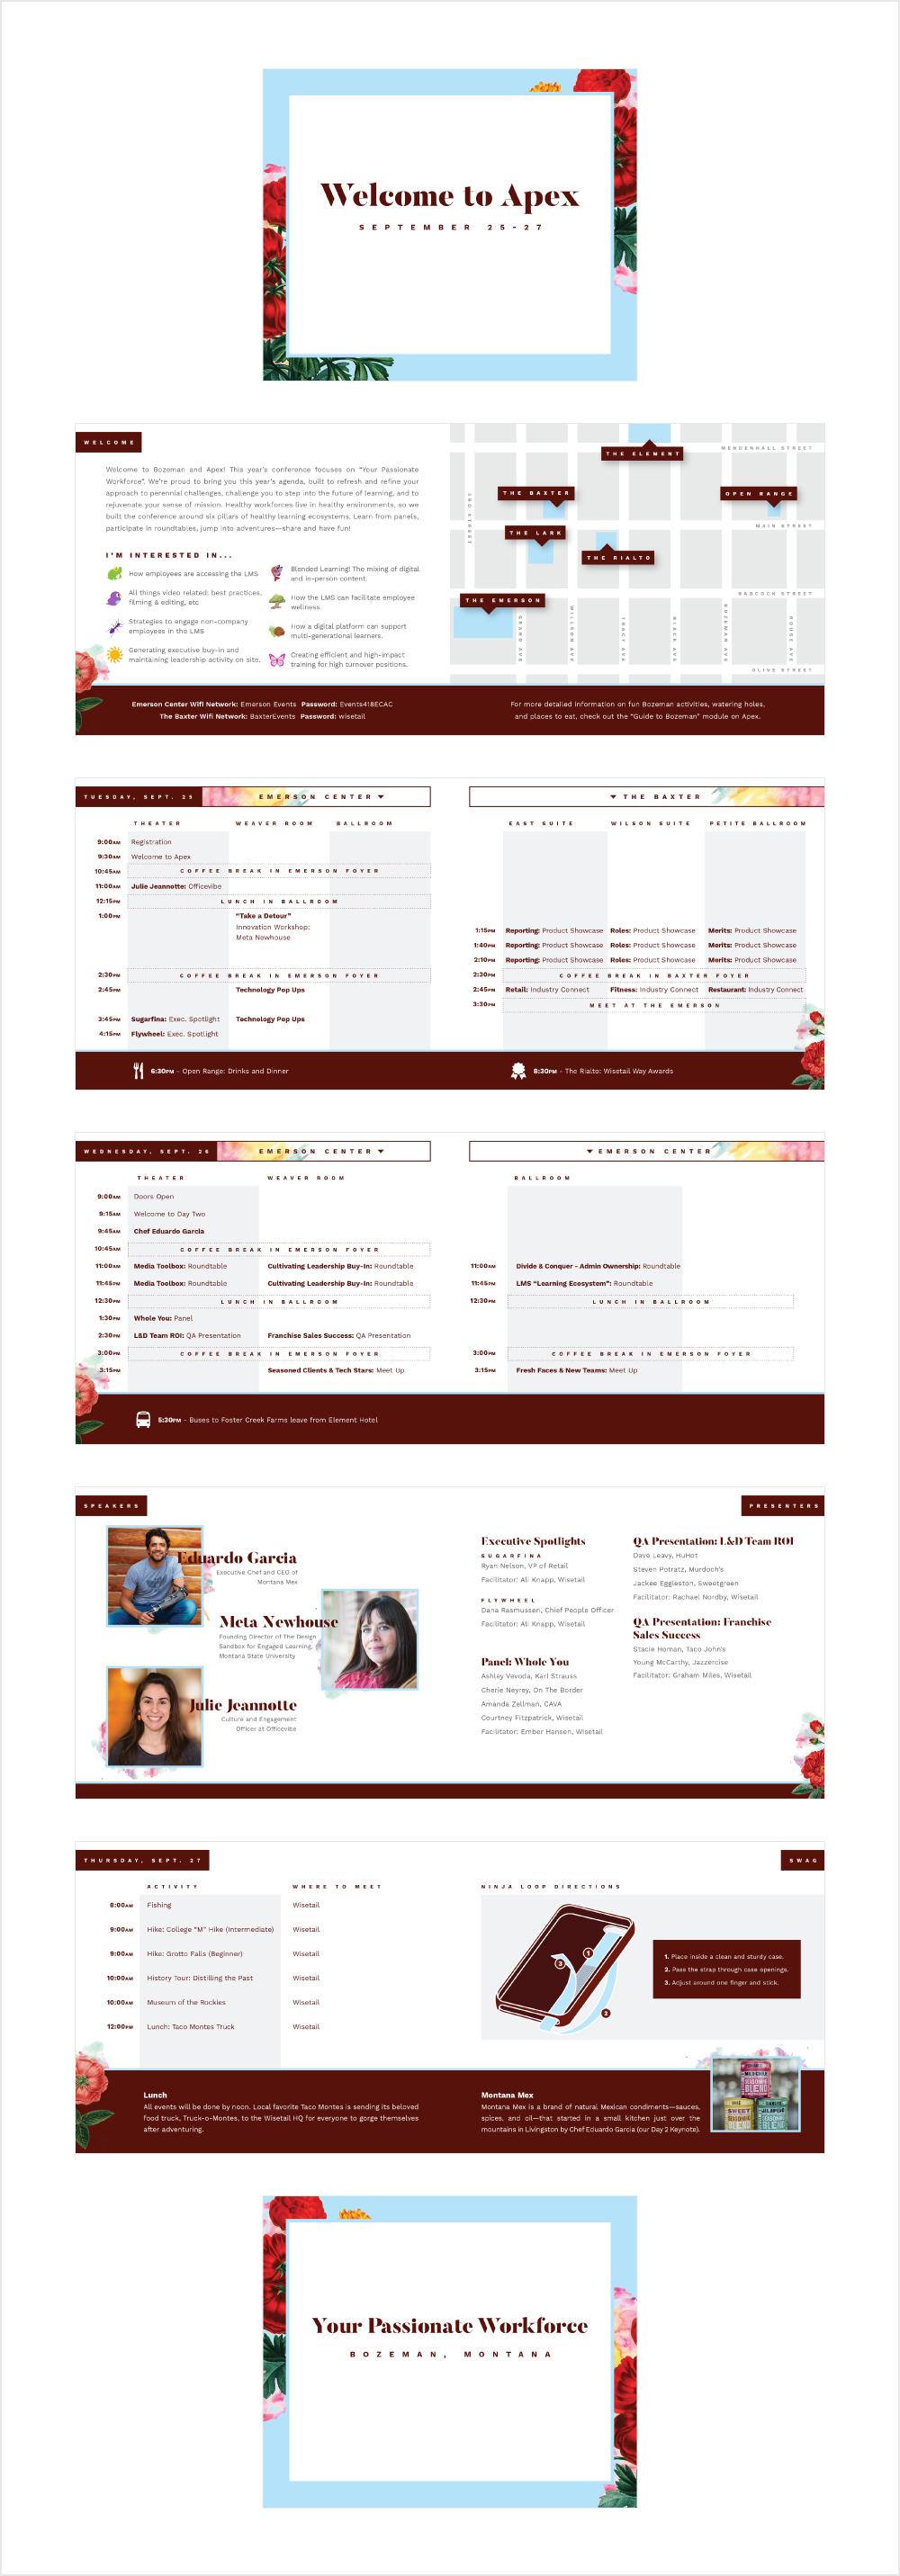 raymond-lombard-design-apex-conference-agenda.jpg